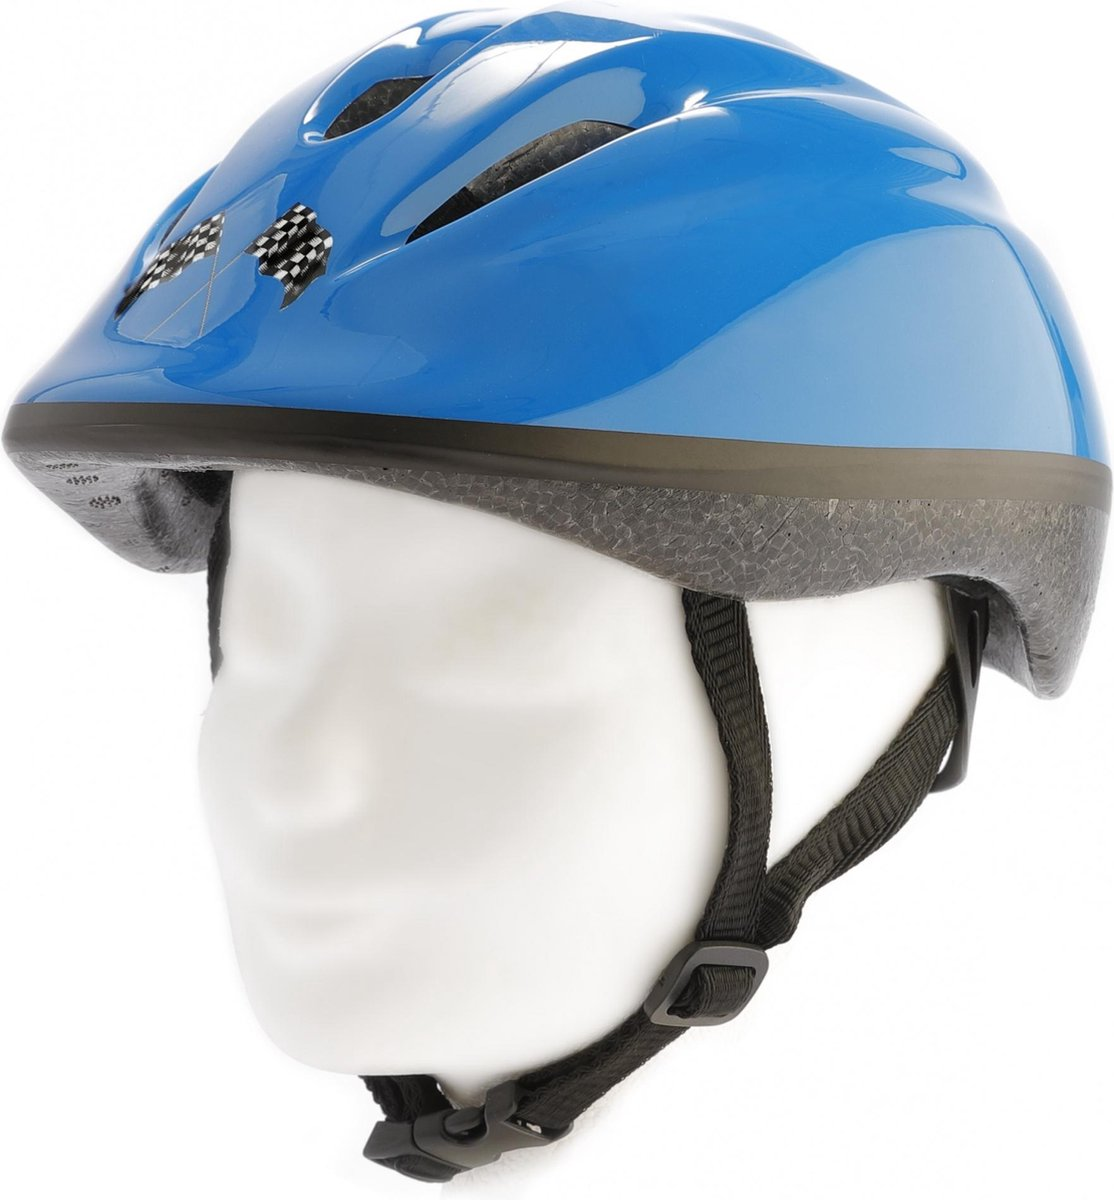 Pexkids fietshelm junior Car maat 52/56 cm blauw